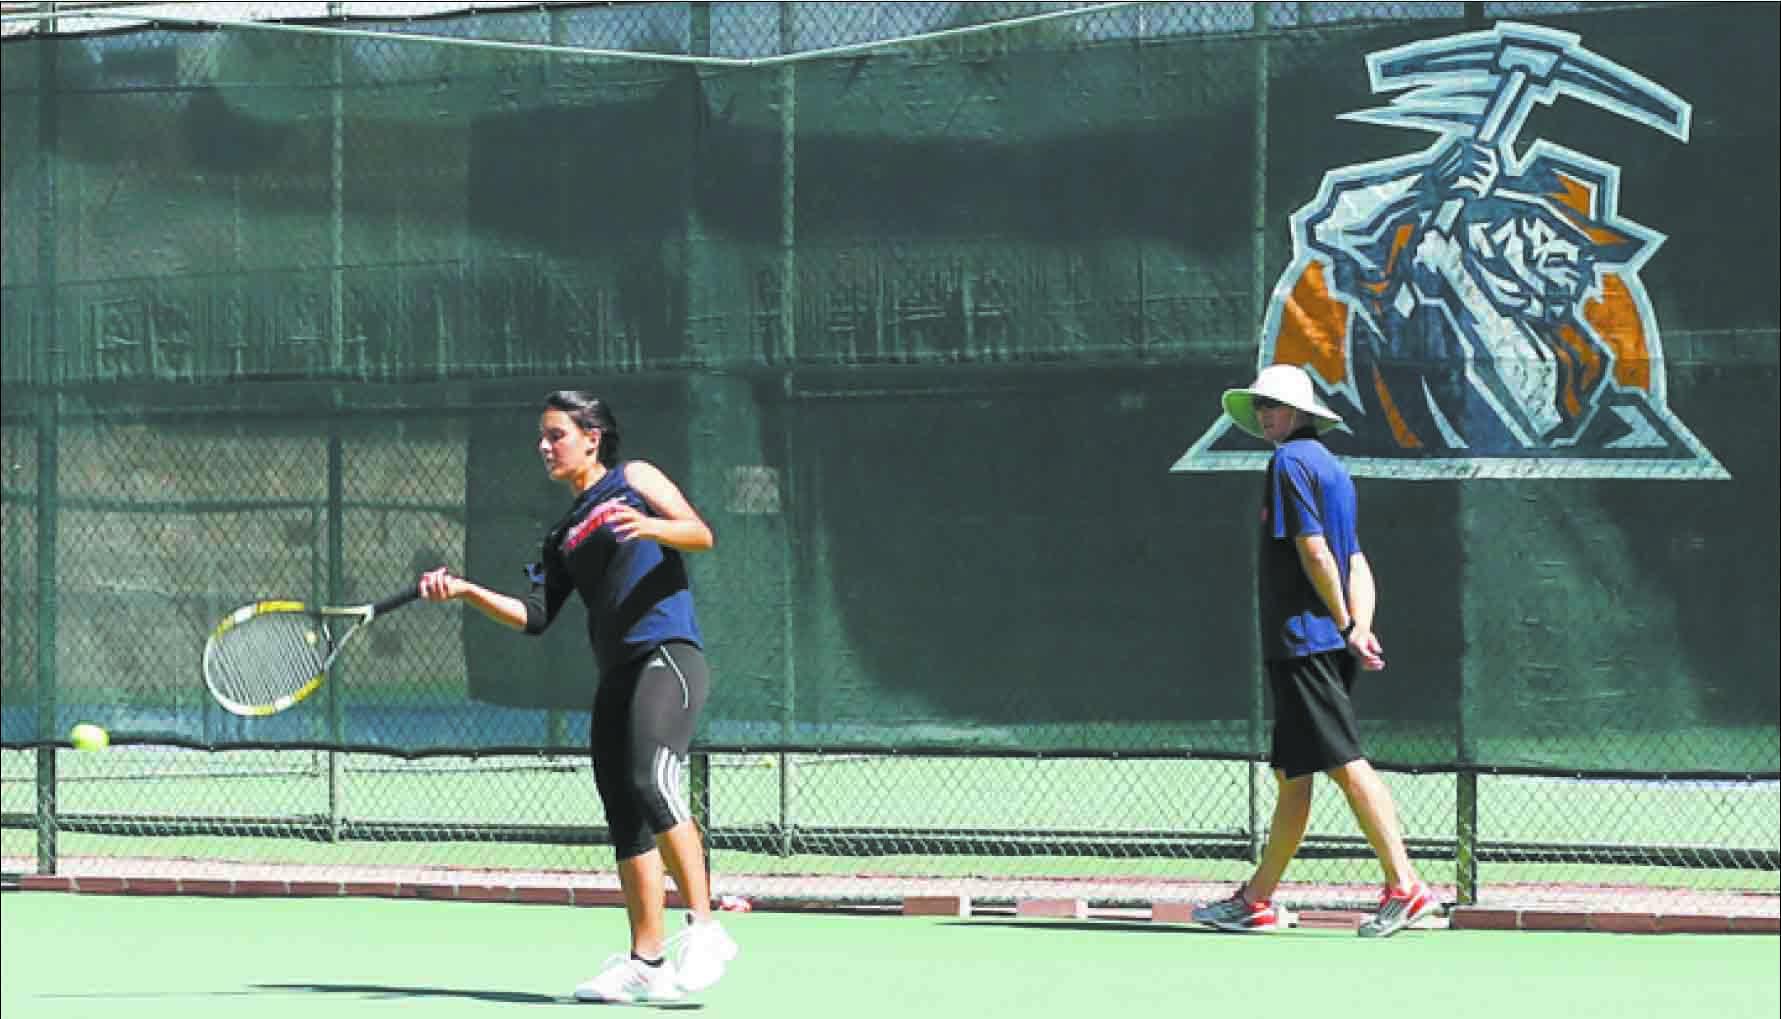 The UTEP tennis team is preparing for their toughest challenge so far this season at the University of Arizona tournament in Tucson.